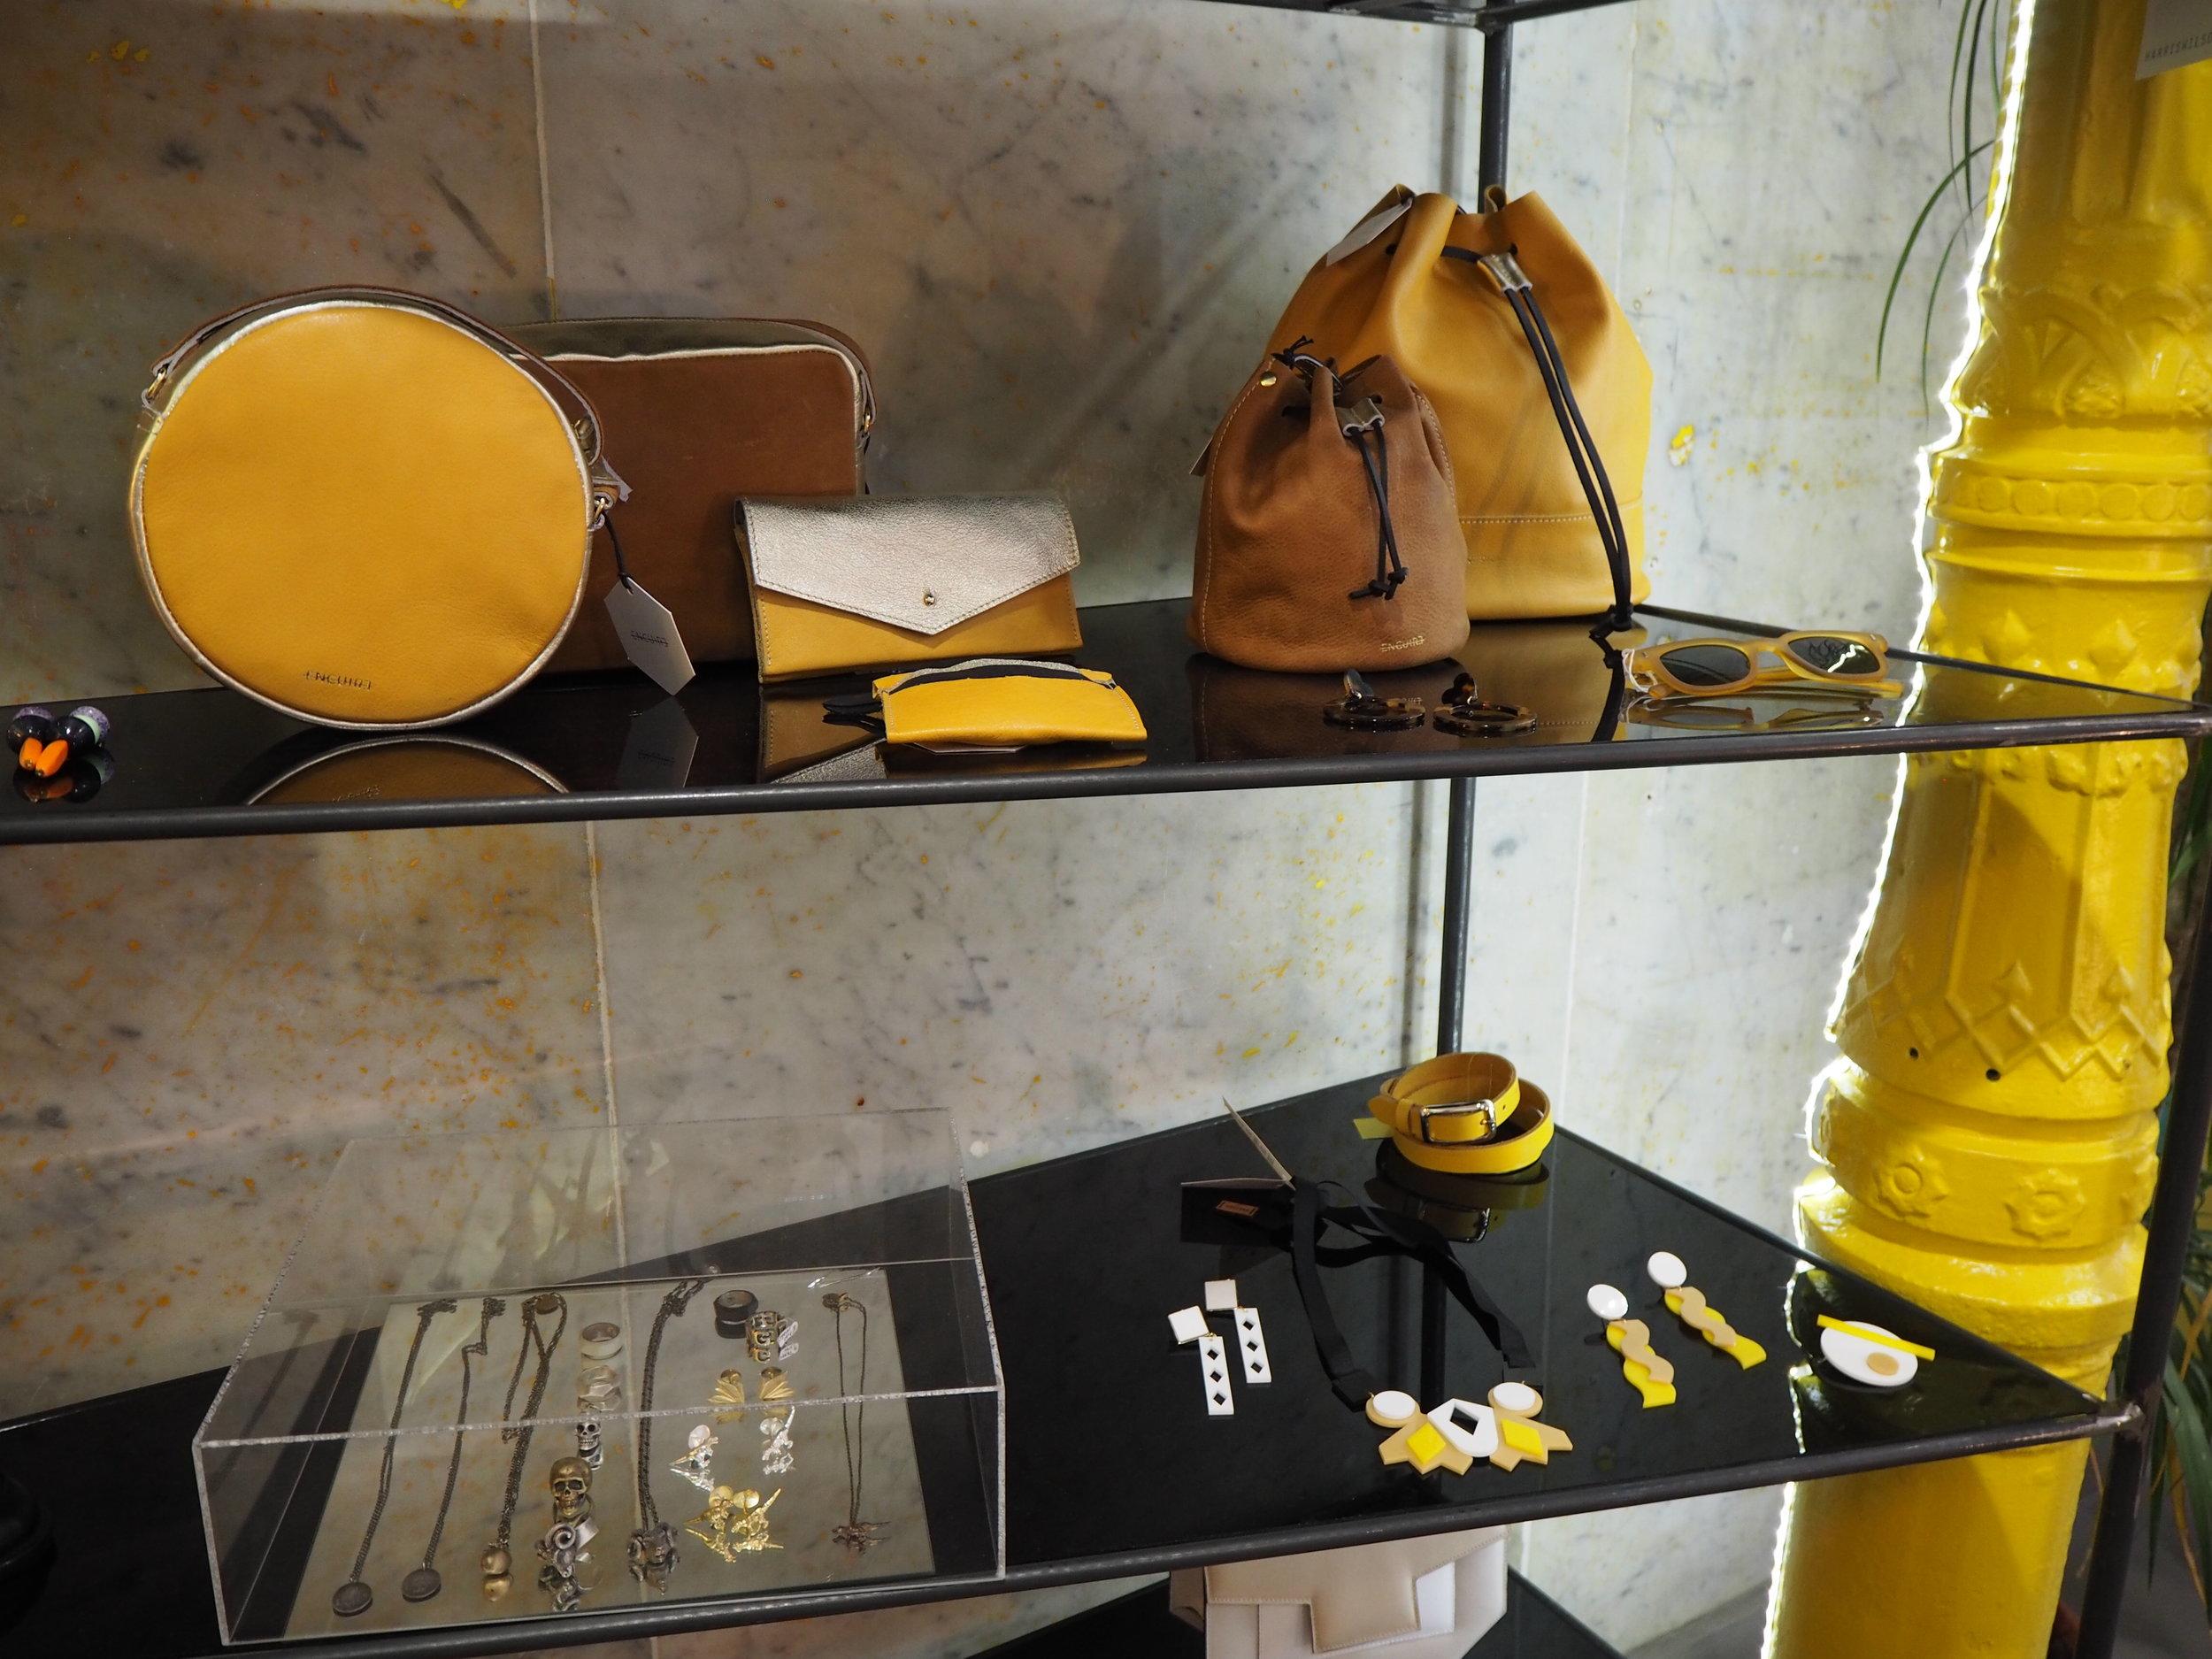 tiendas-ropa-madrid-originales-papiroga.JPG